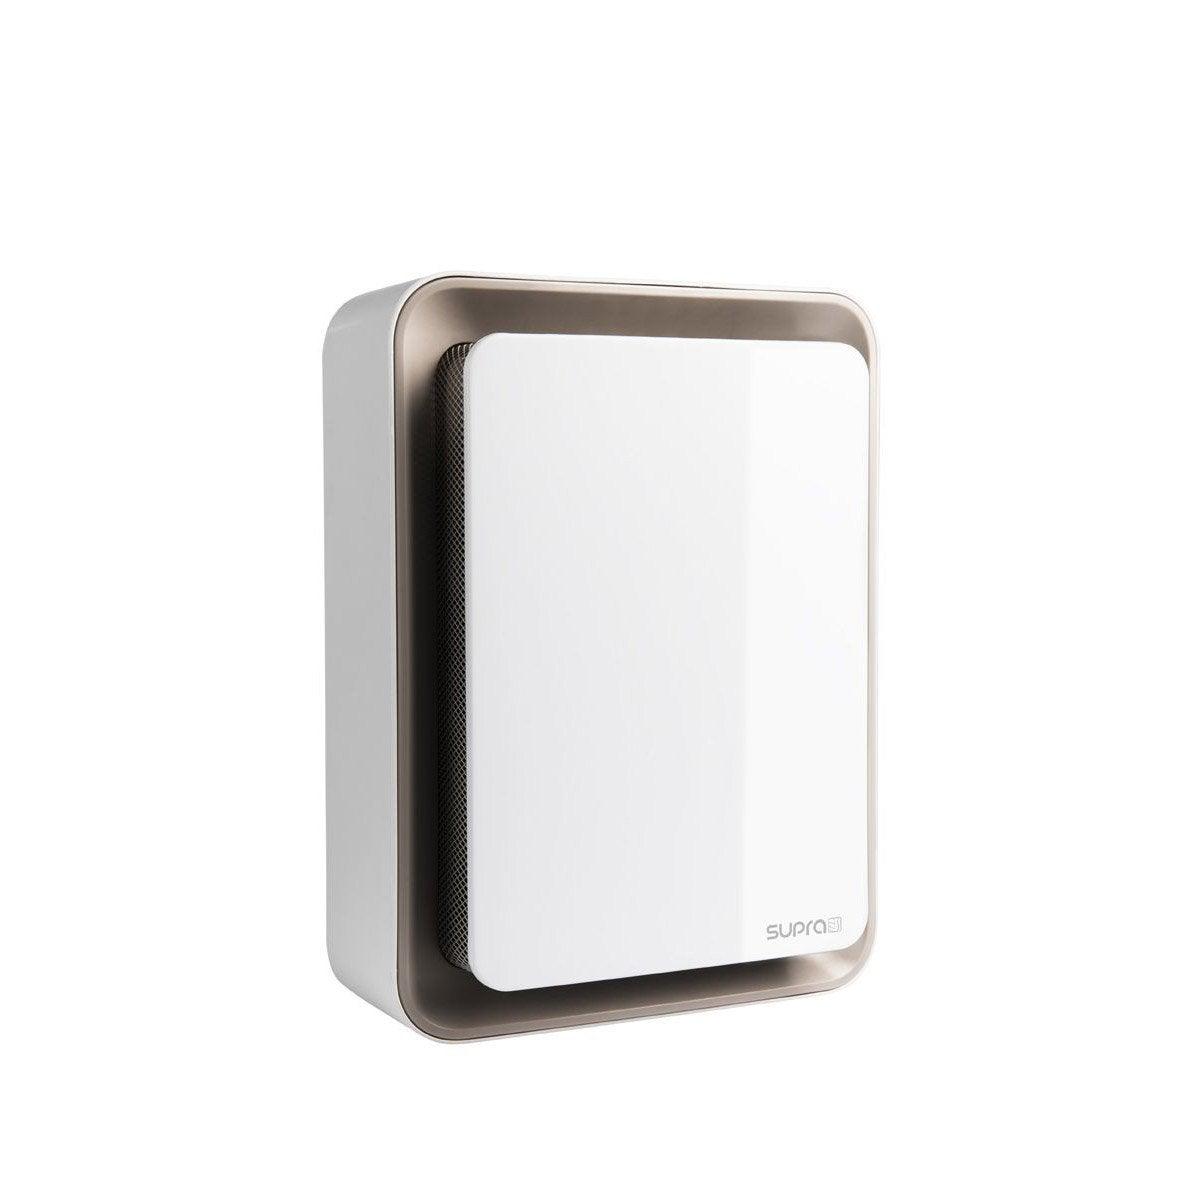 Radiateur Soufflant Electrique Supra Zitto 11 Blanc Taupe 1800 W